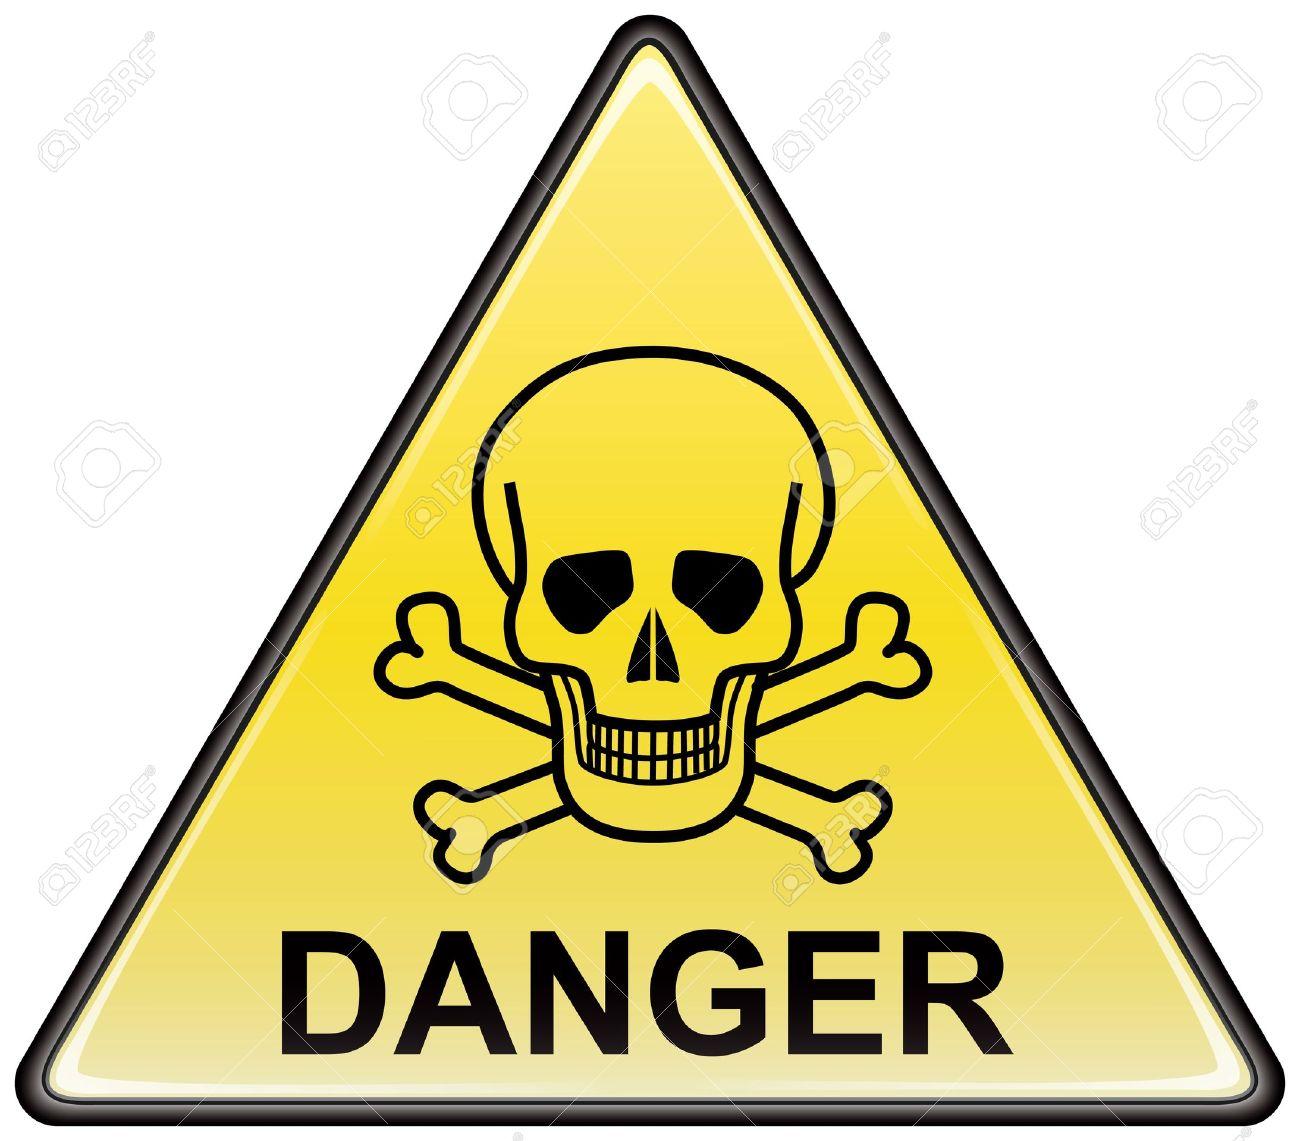 Danger clipart #15, Download drawings